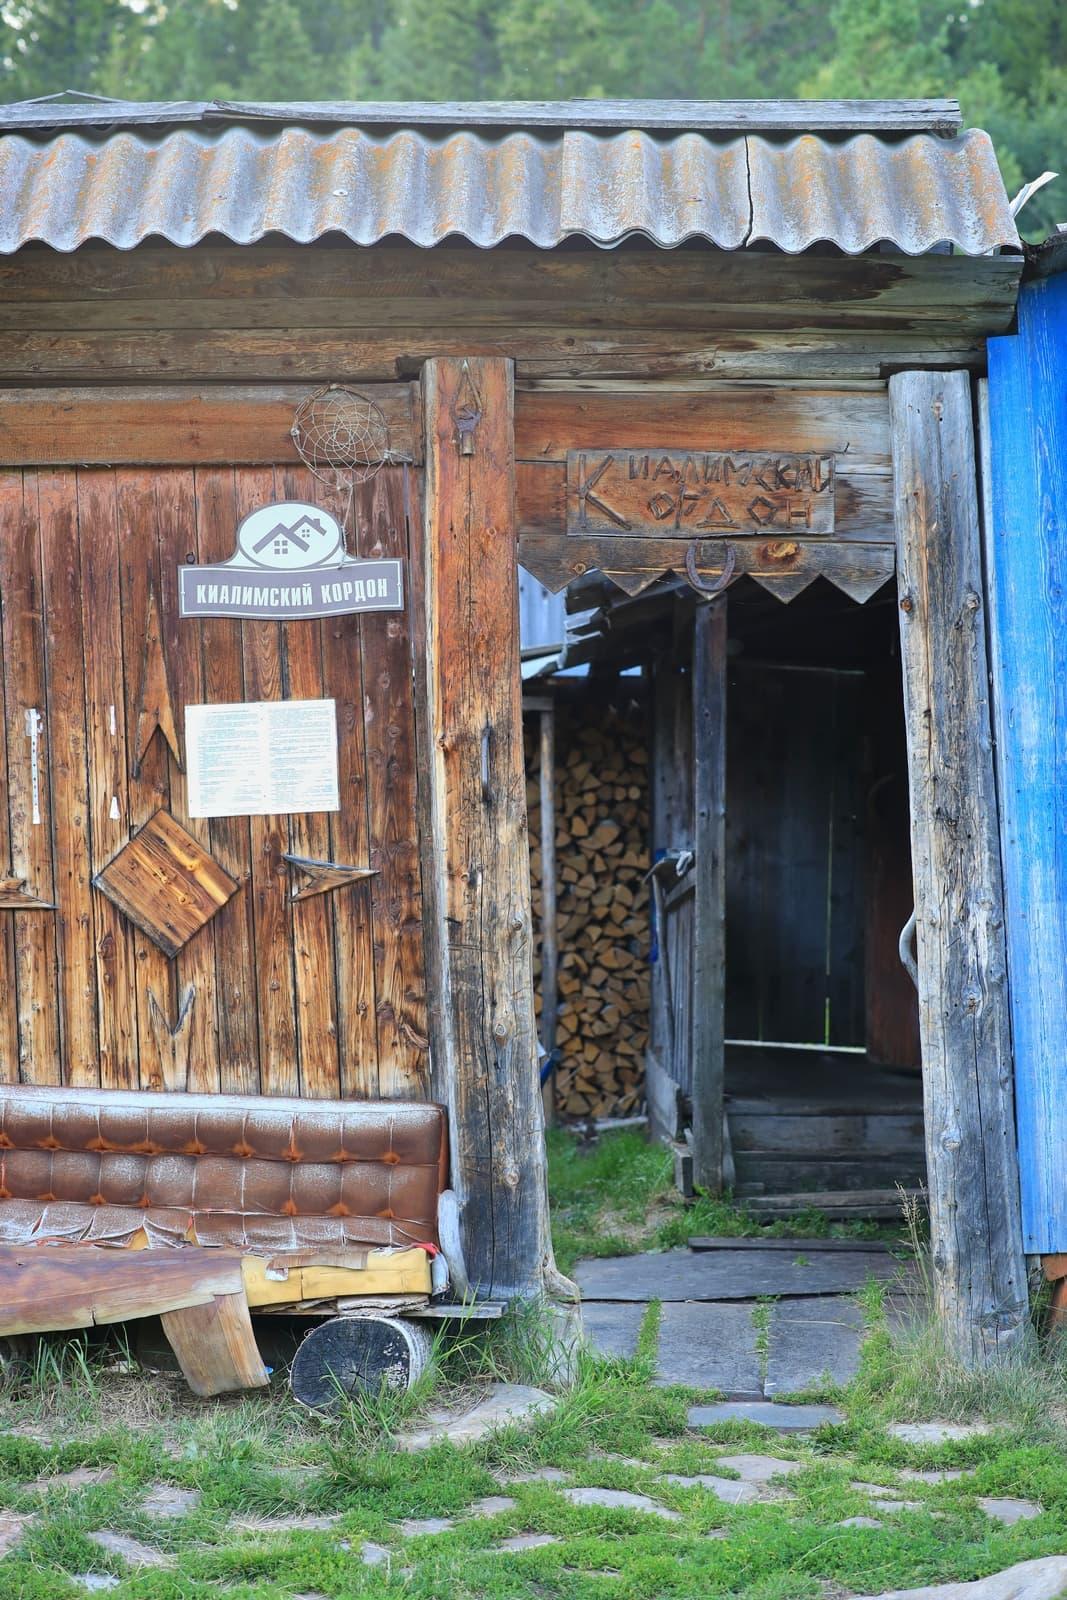 Ворота дома смотрителя на Киалимском кордоне